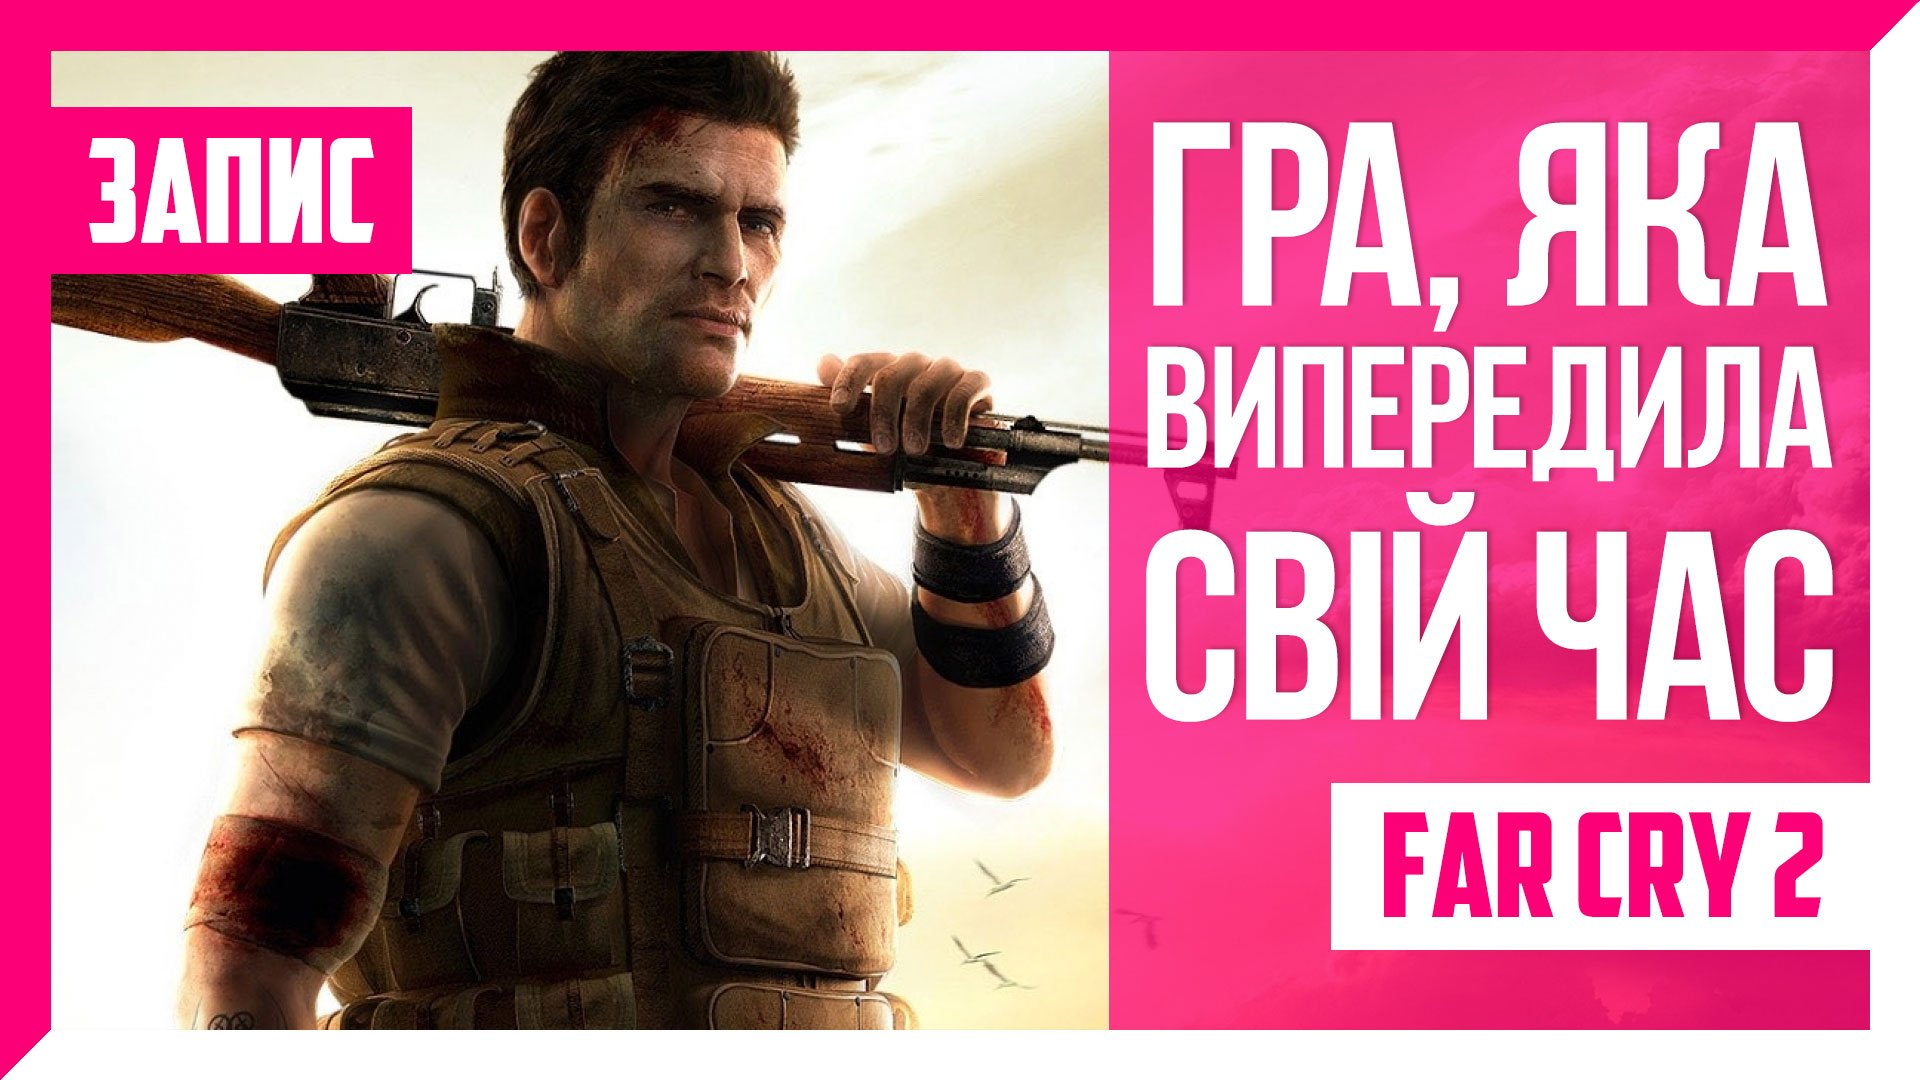 Far Cry 2. Стрімомарафон Far Cry #02 by @AbsoKulikov   ЗАПИС